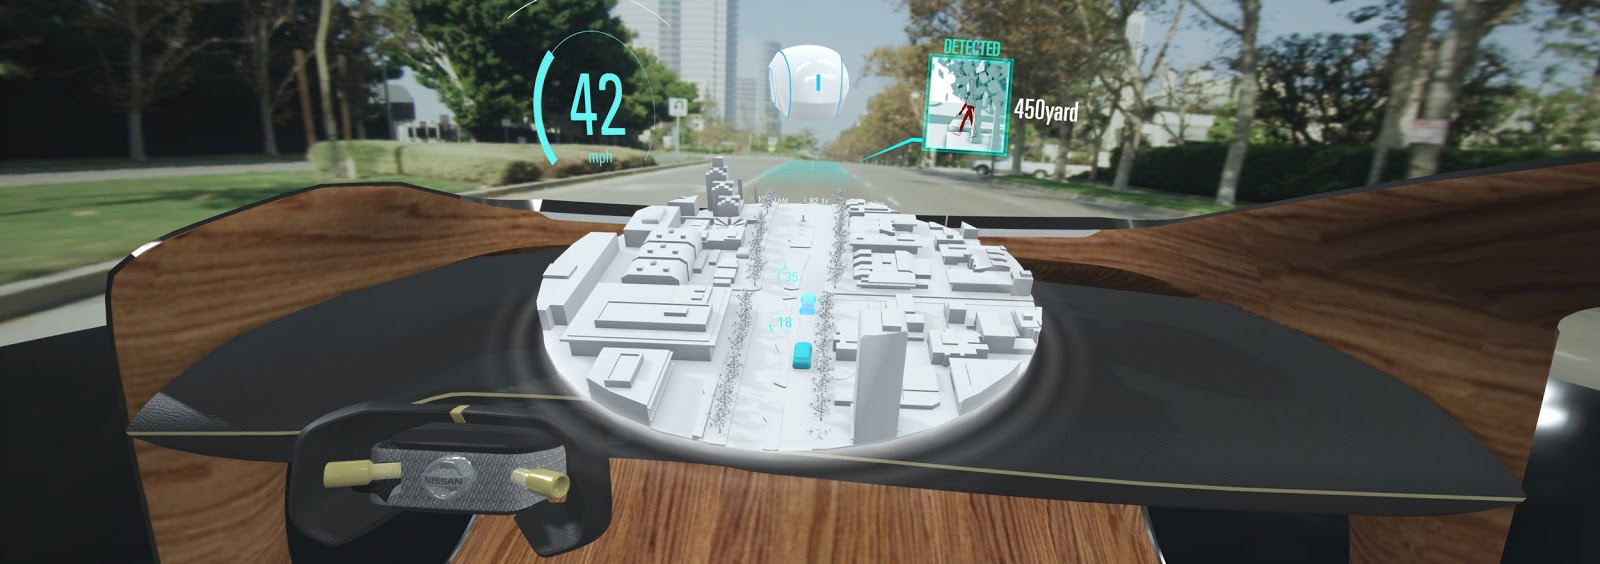 NISSAN I2V 3 Η Nissan σχεδιάζει augmented reality για τα μοντέλα της Nissan, zblog, τεχνικά, Τεχνολογία